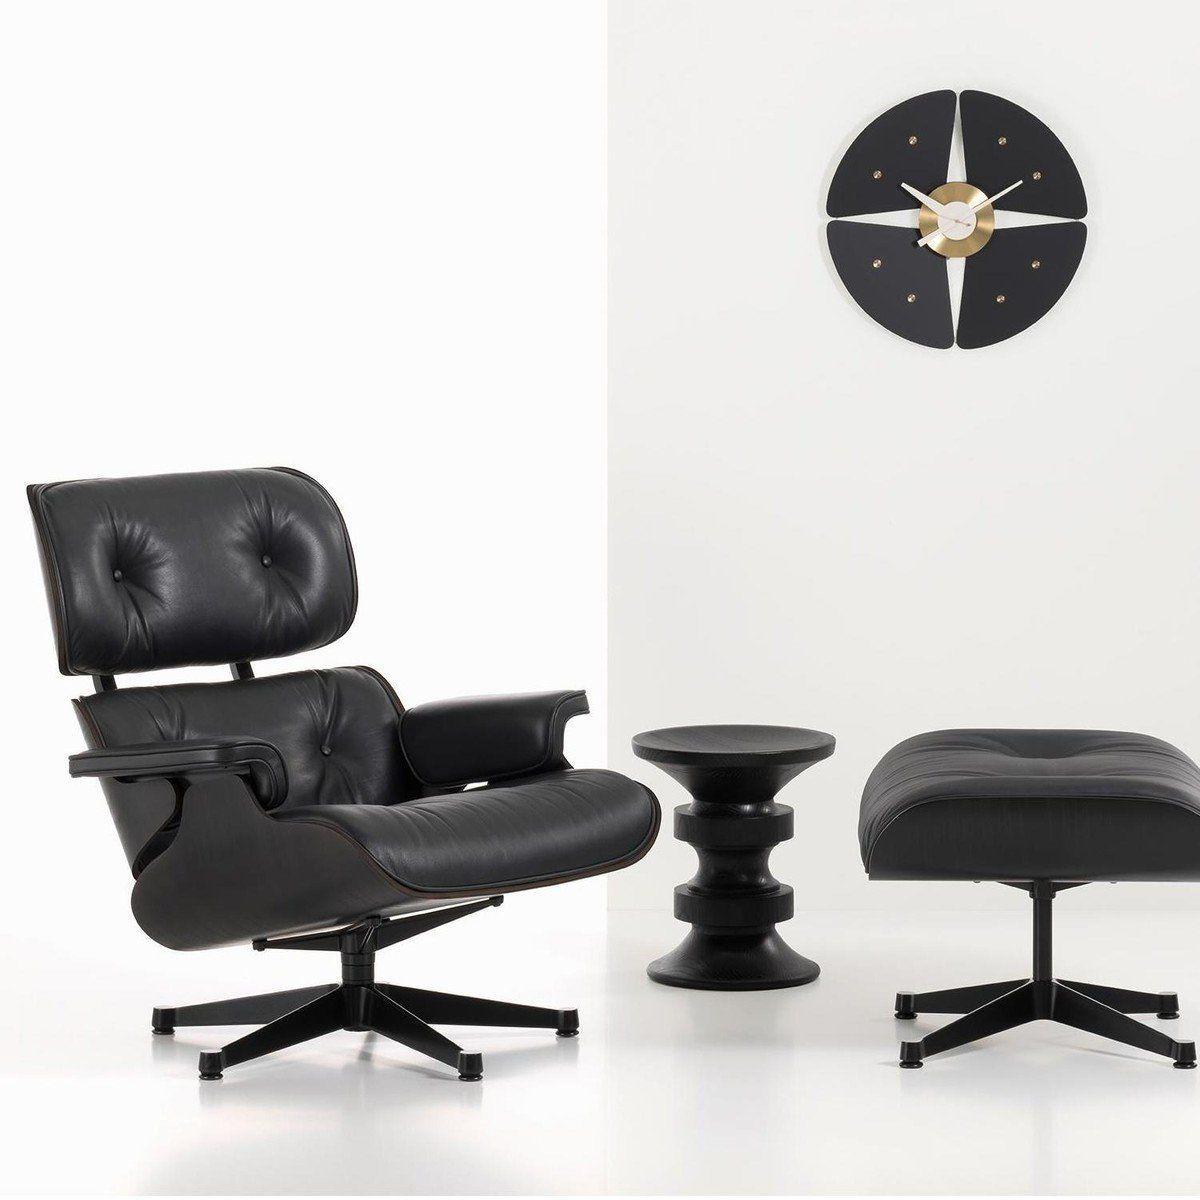 eames lounge chair sessel ottoman vitra. Black Bedroom Furniture Sets. Home Design Ideas